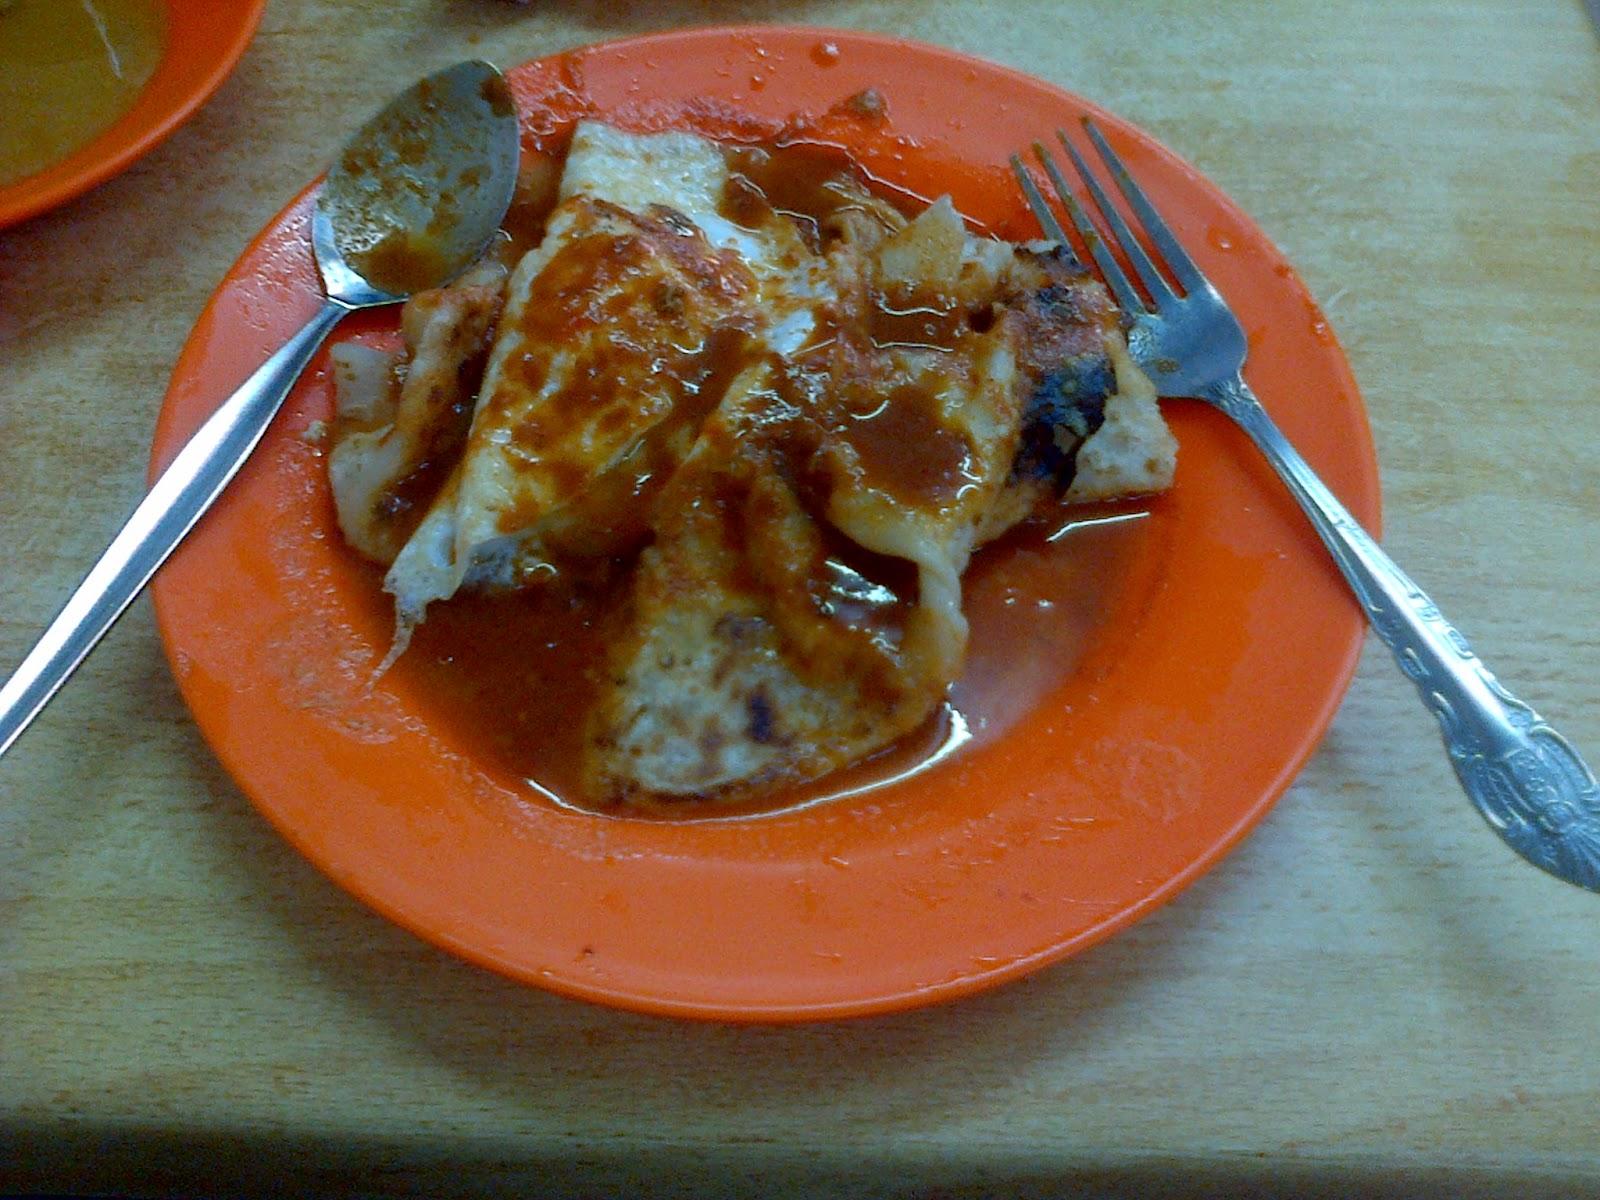 Roti canai, Penang, Argyll Road, Terbaik